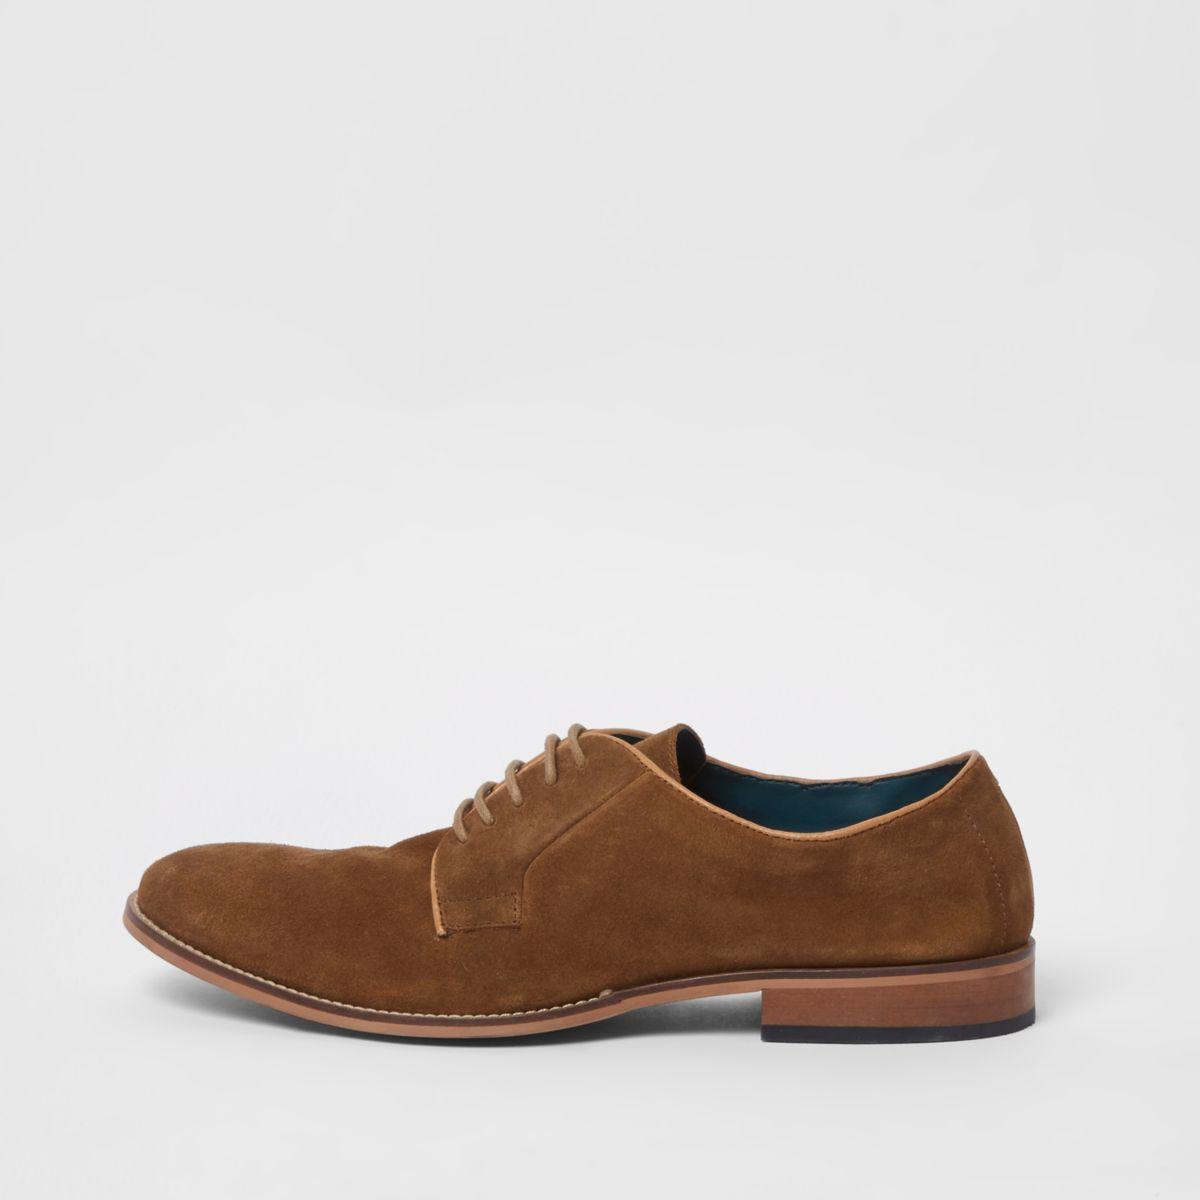 Brown suede derby shoes